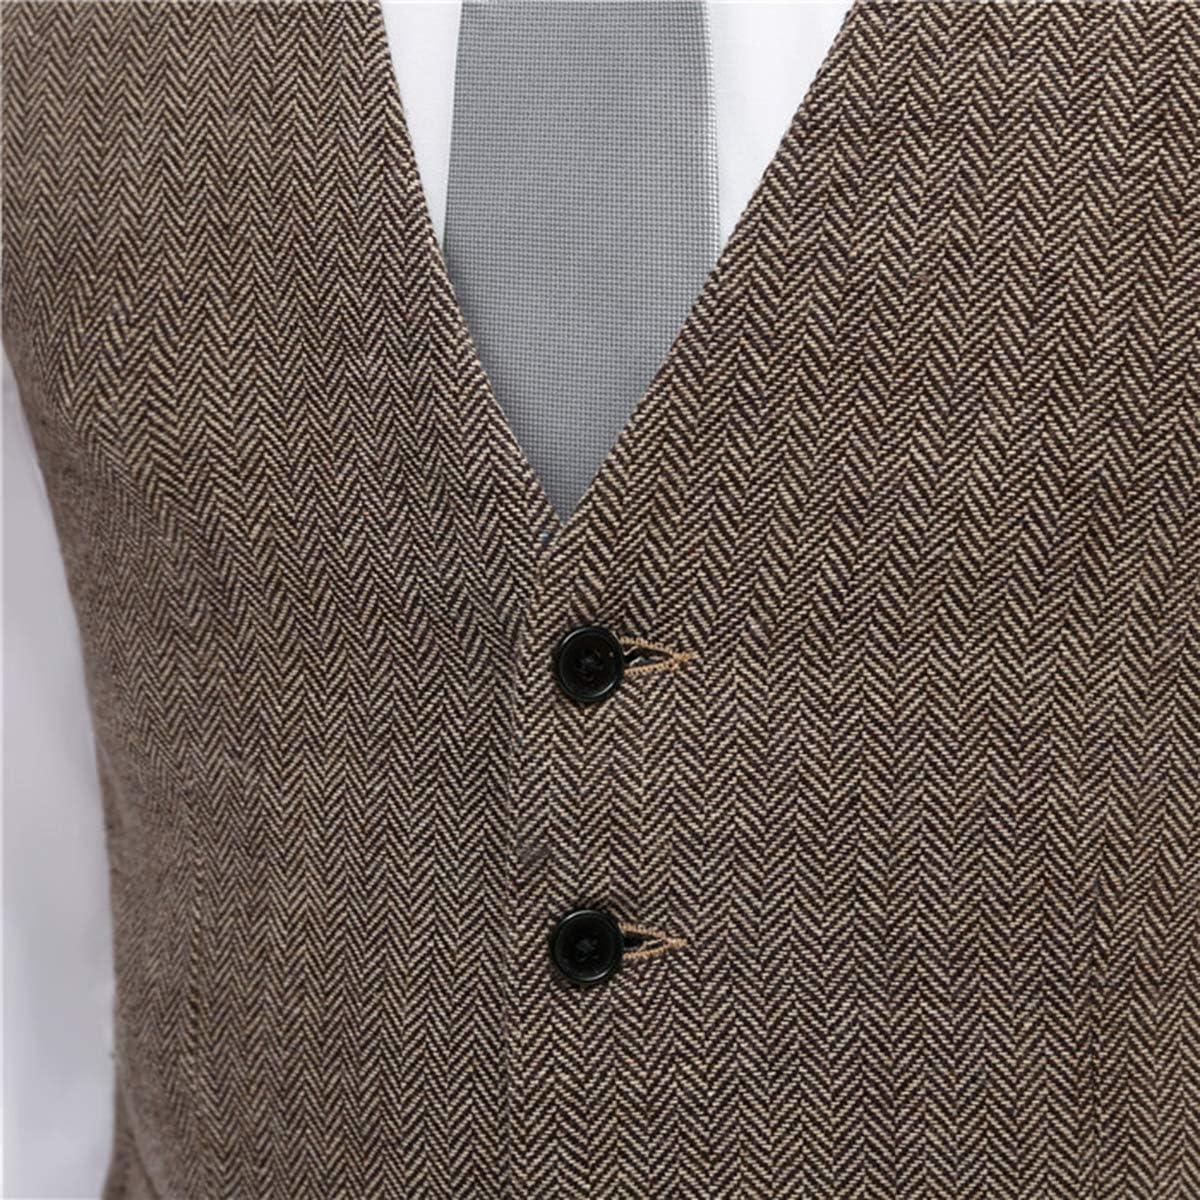 LoveeToo Mens Slim Fit V-Neck Vest Casual Waistcoat Business Suit Vest Wedding Dress Waistcoat